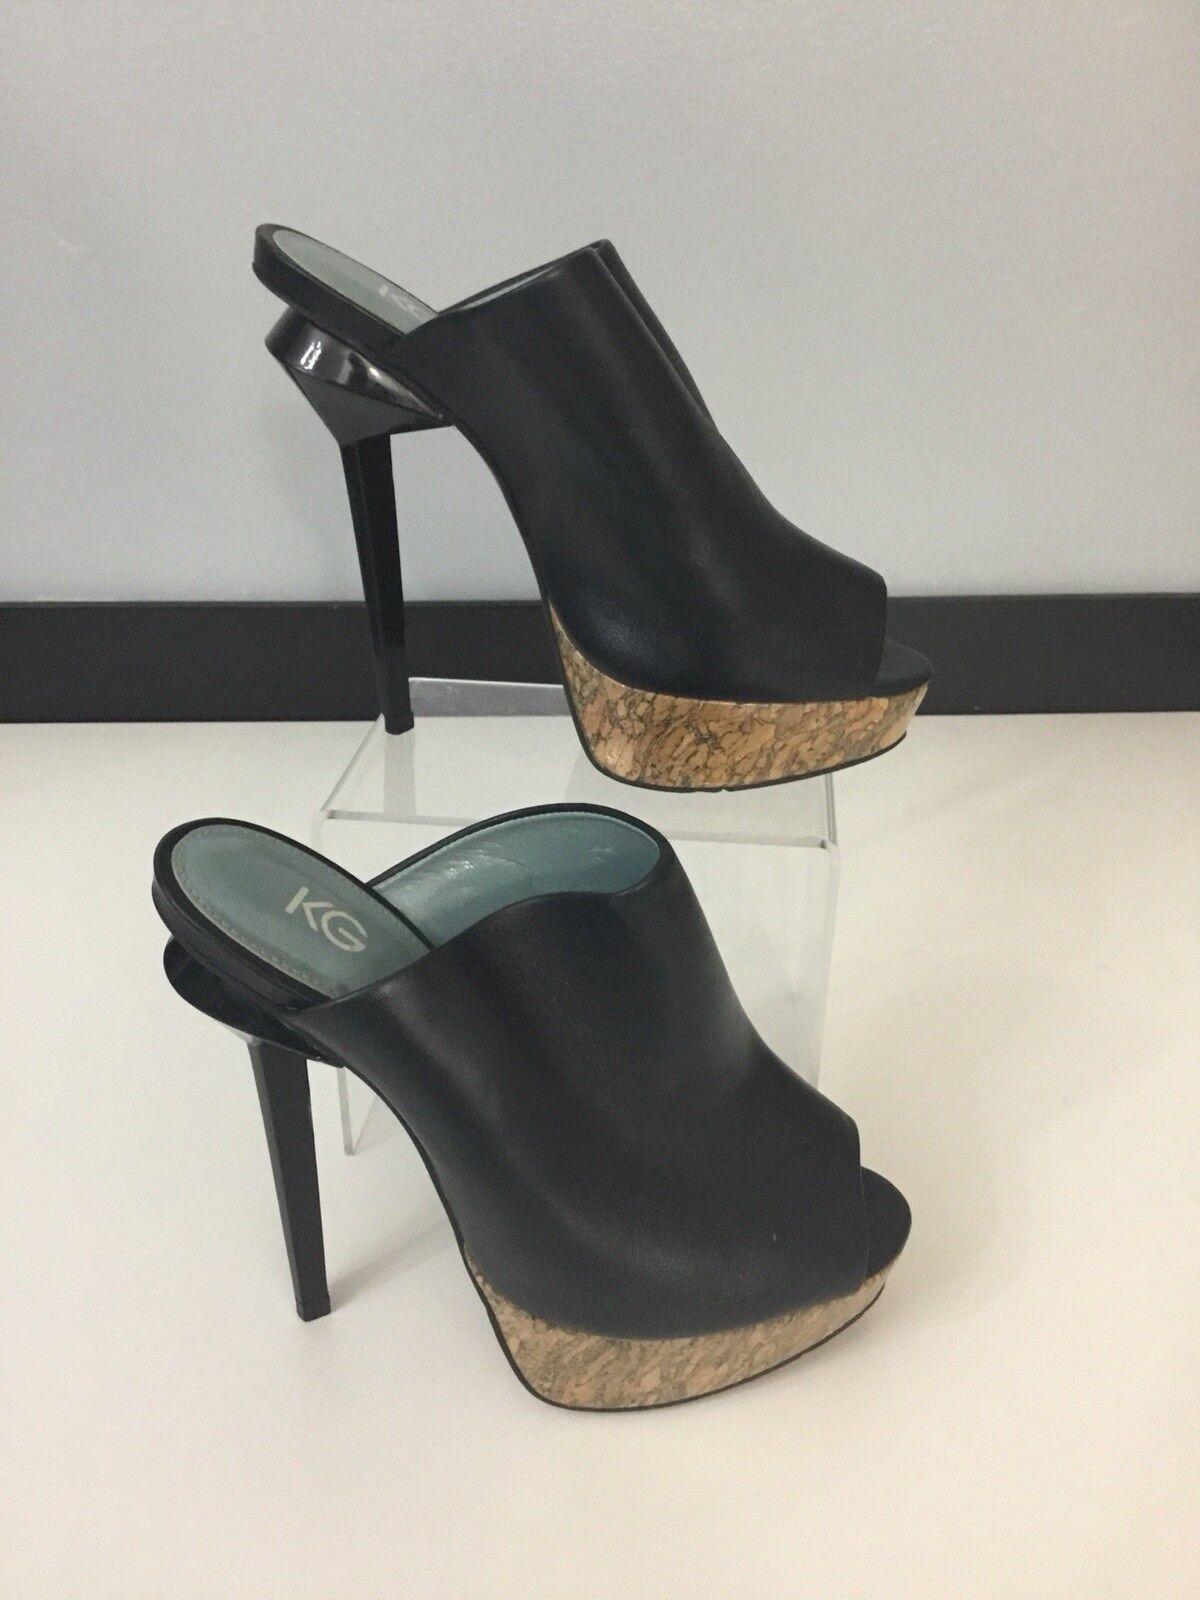 Kurt Geiger KG Womens,  shoes High Heels, Black Leather, Size Uk 4 Eu 37, In Vgc